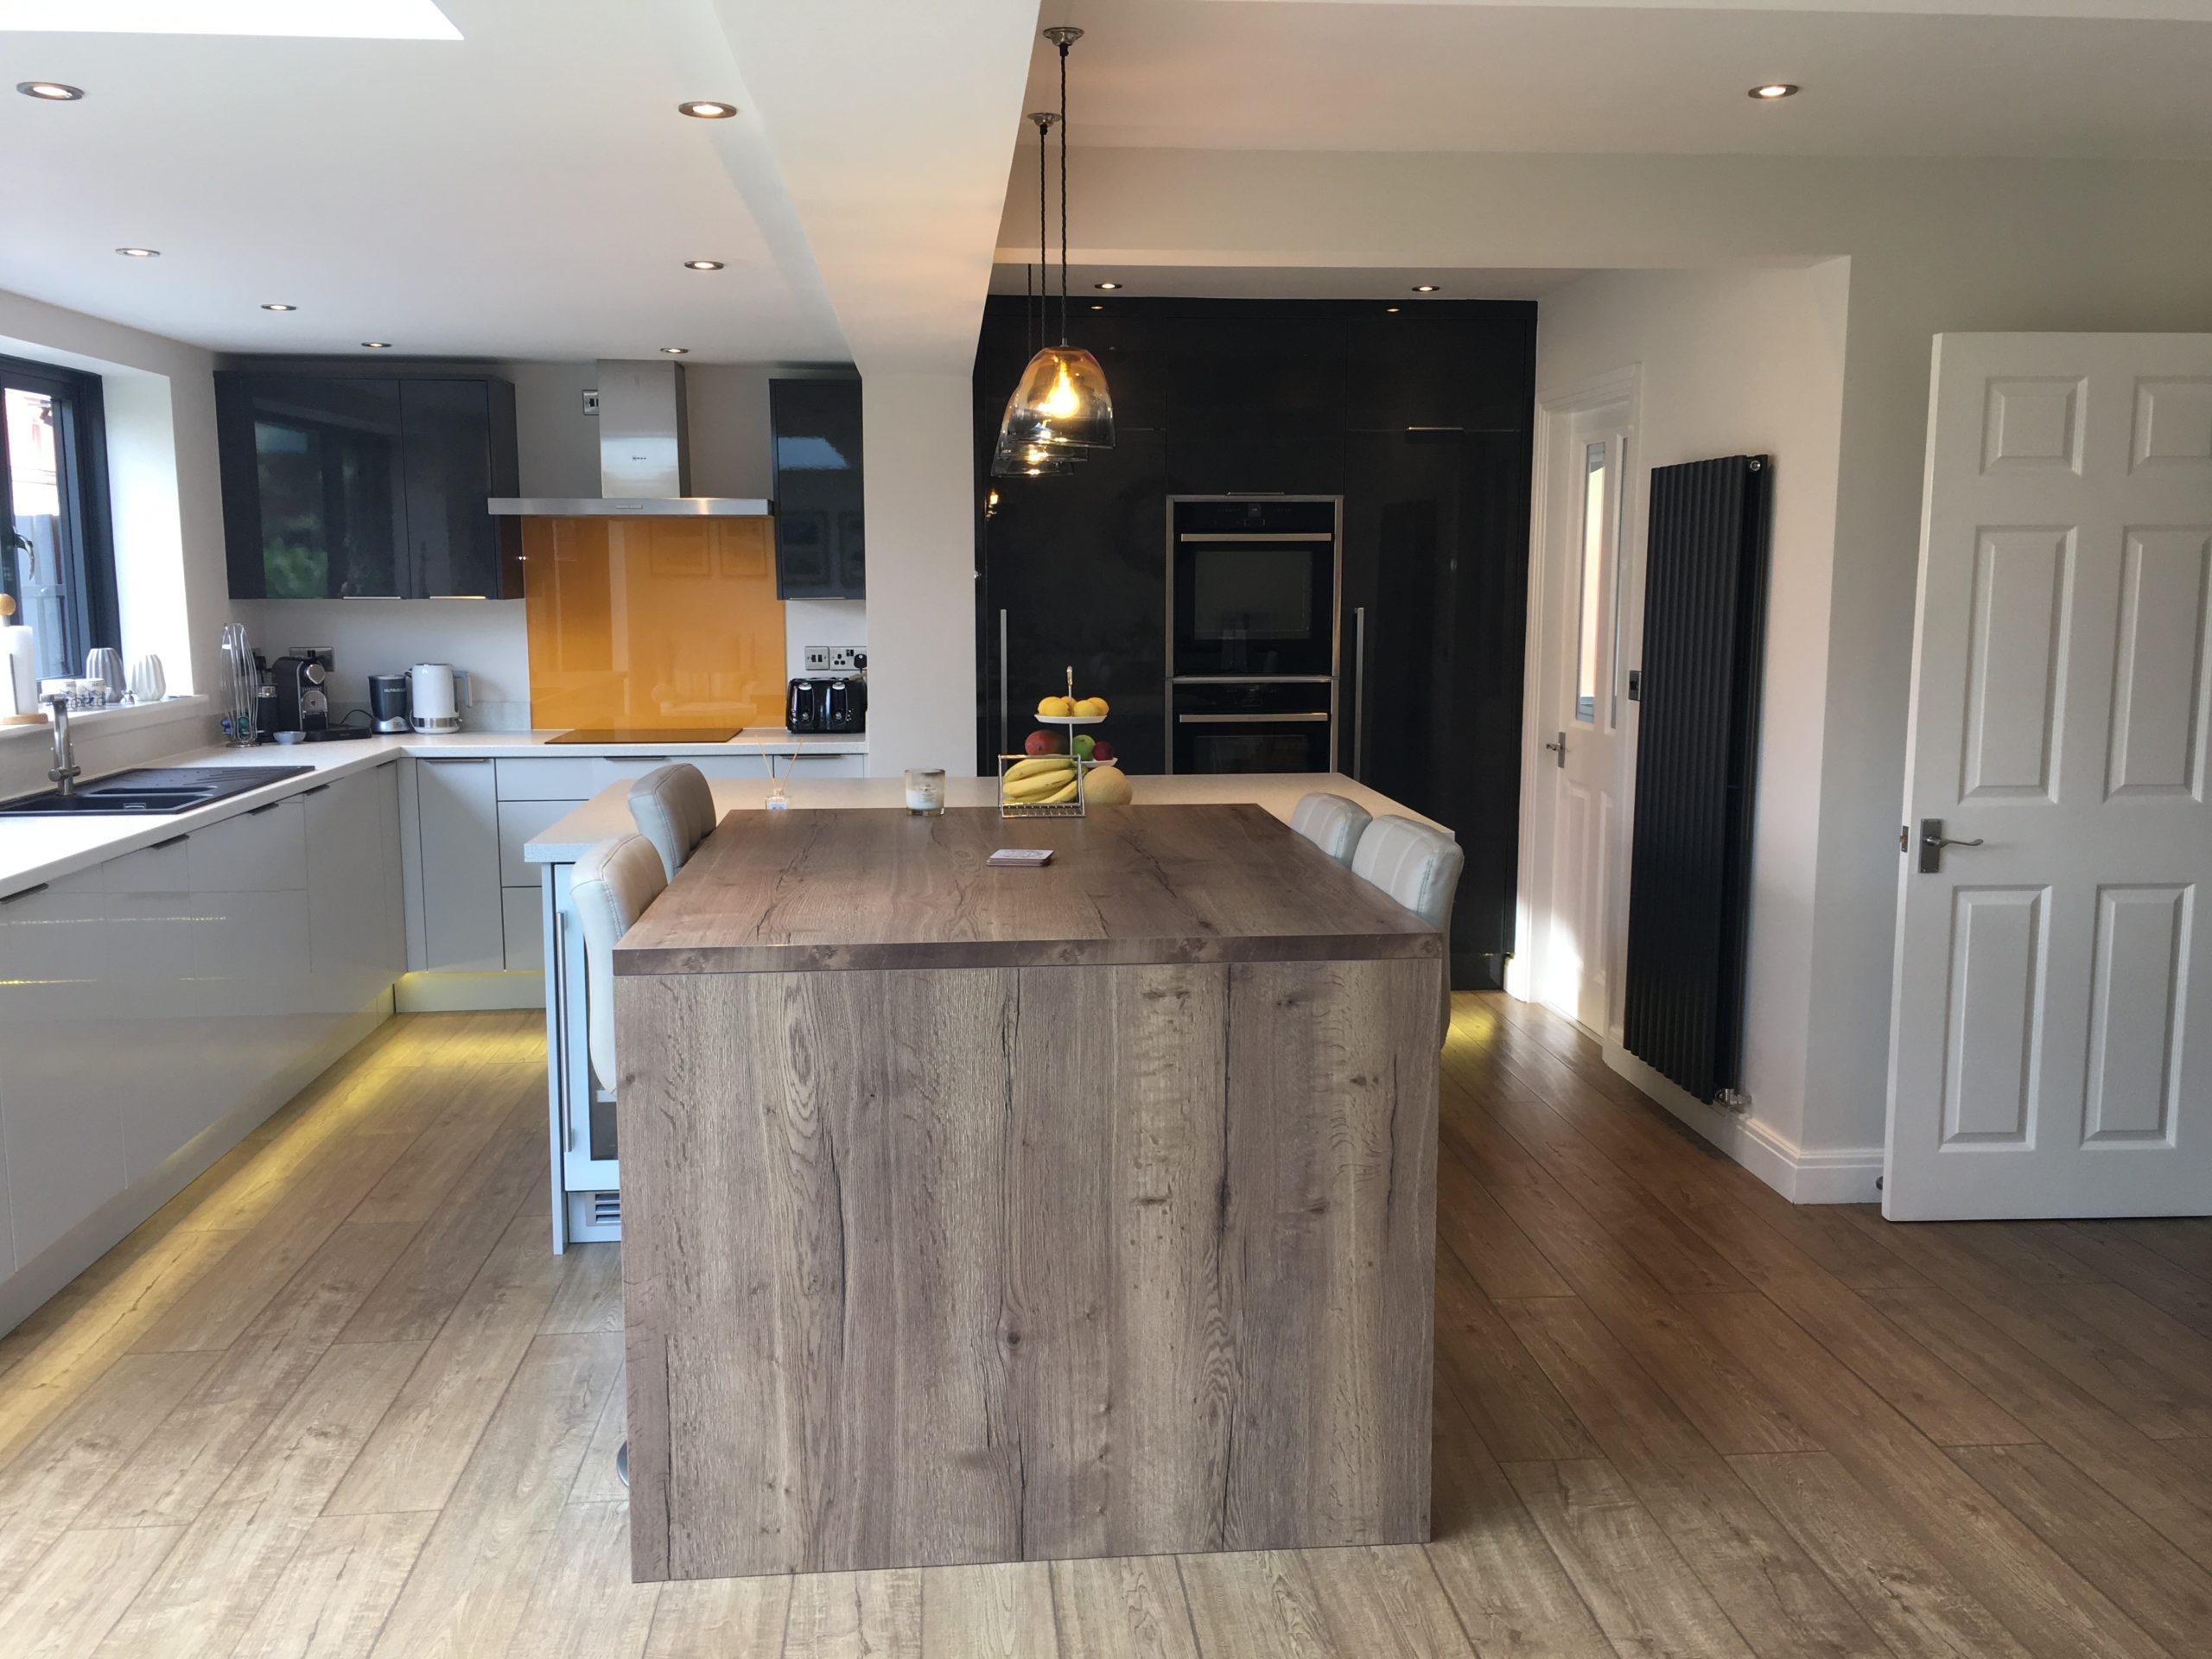 Kitchen of modern single storey extension in Leeds